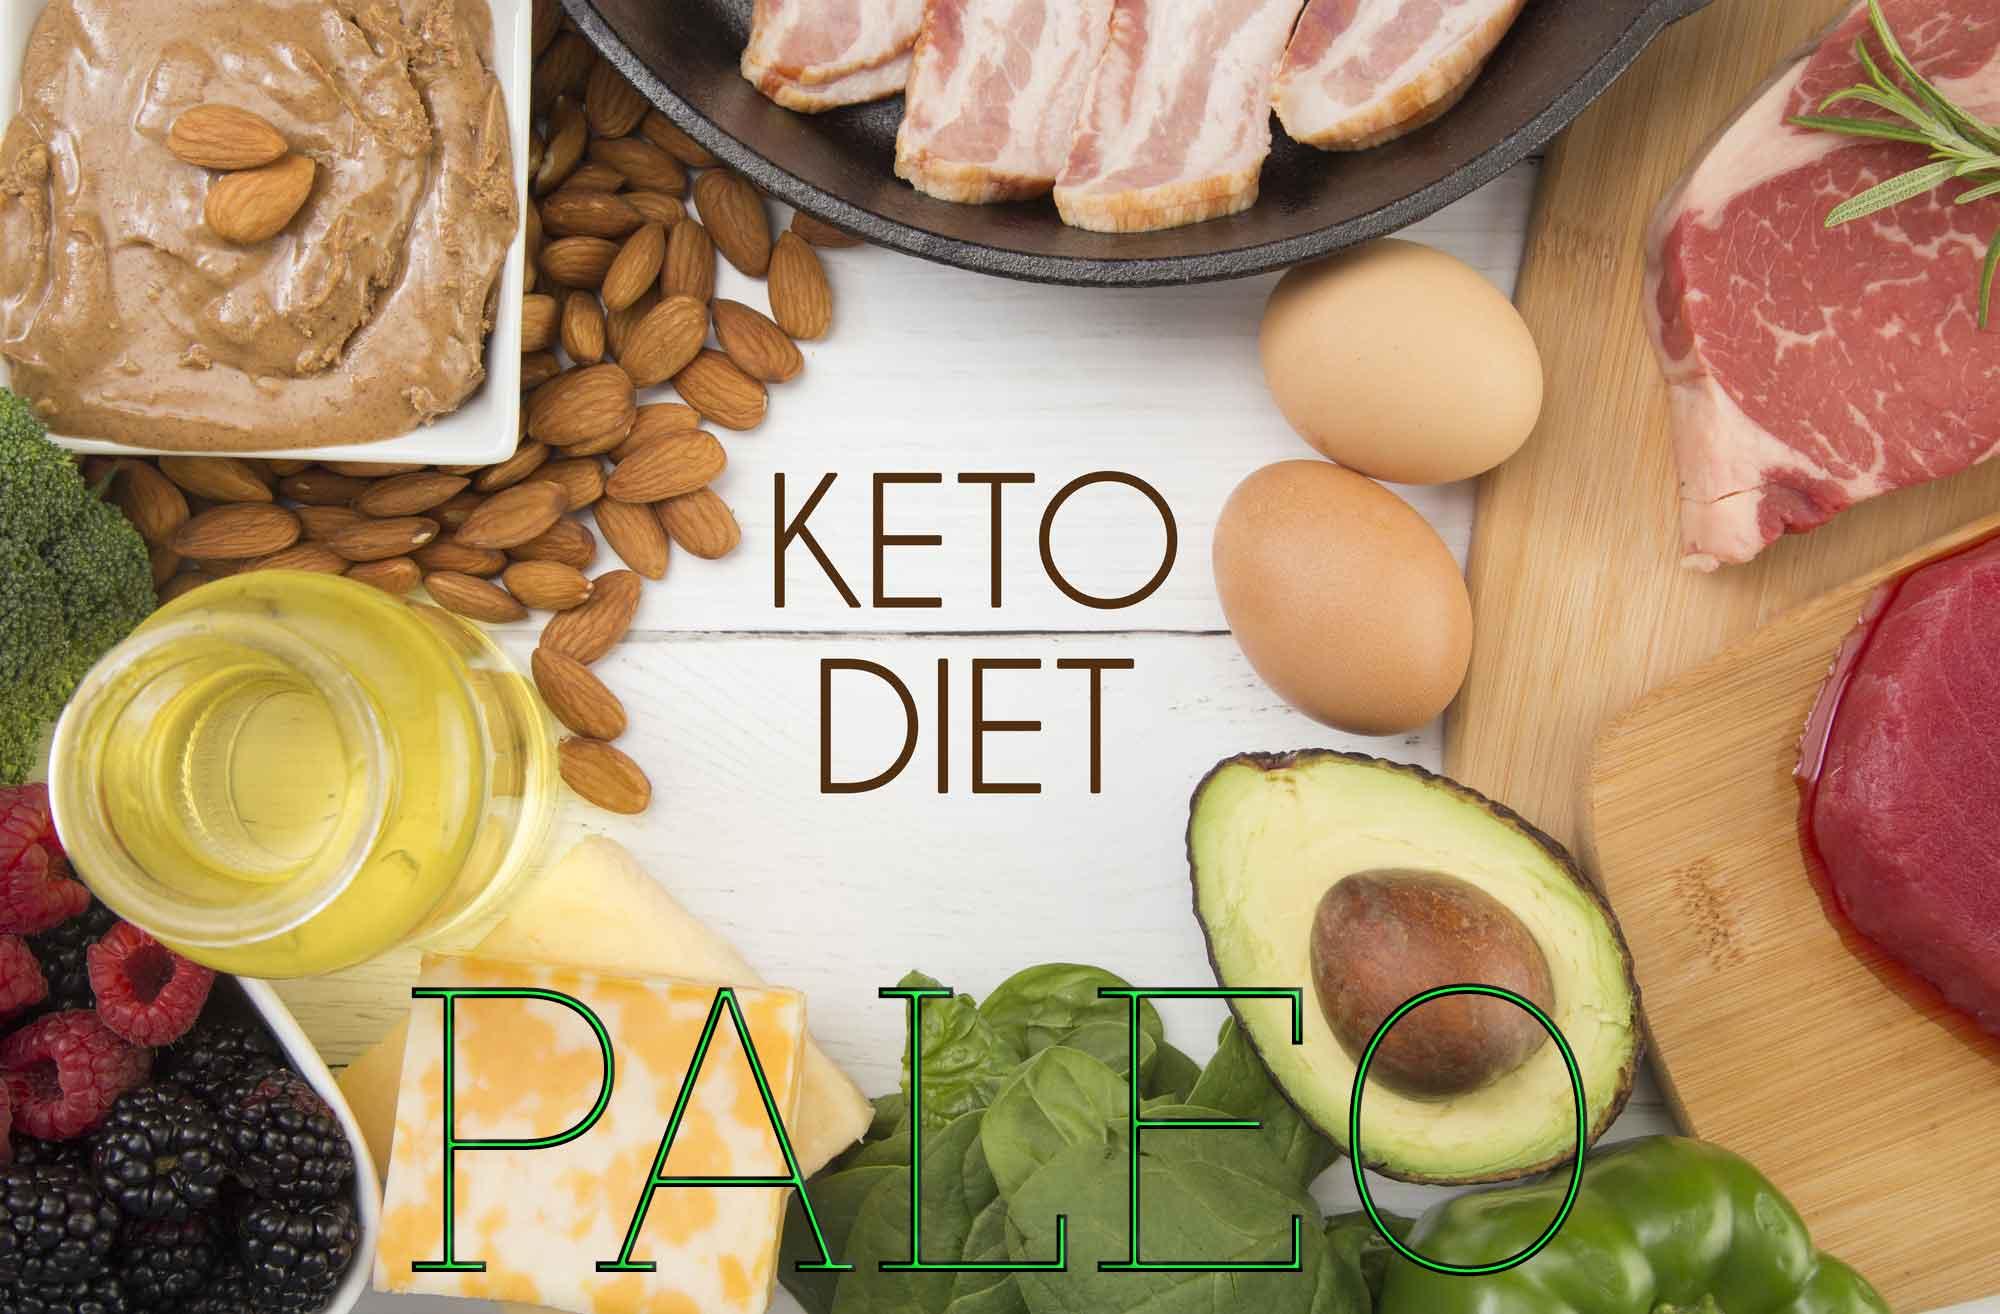 Keto-friendly and Paleo-friendly foods